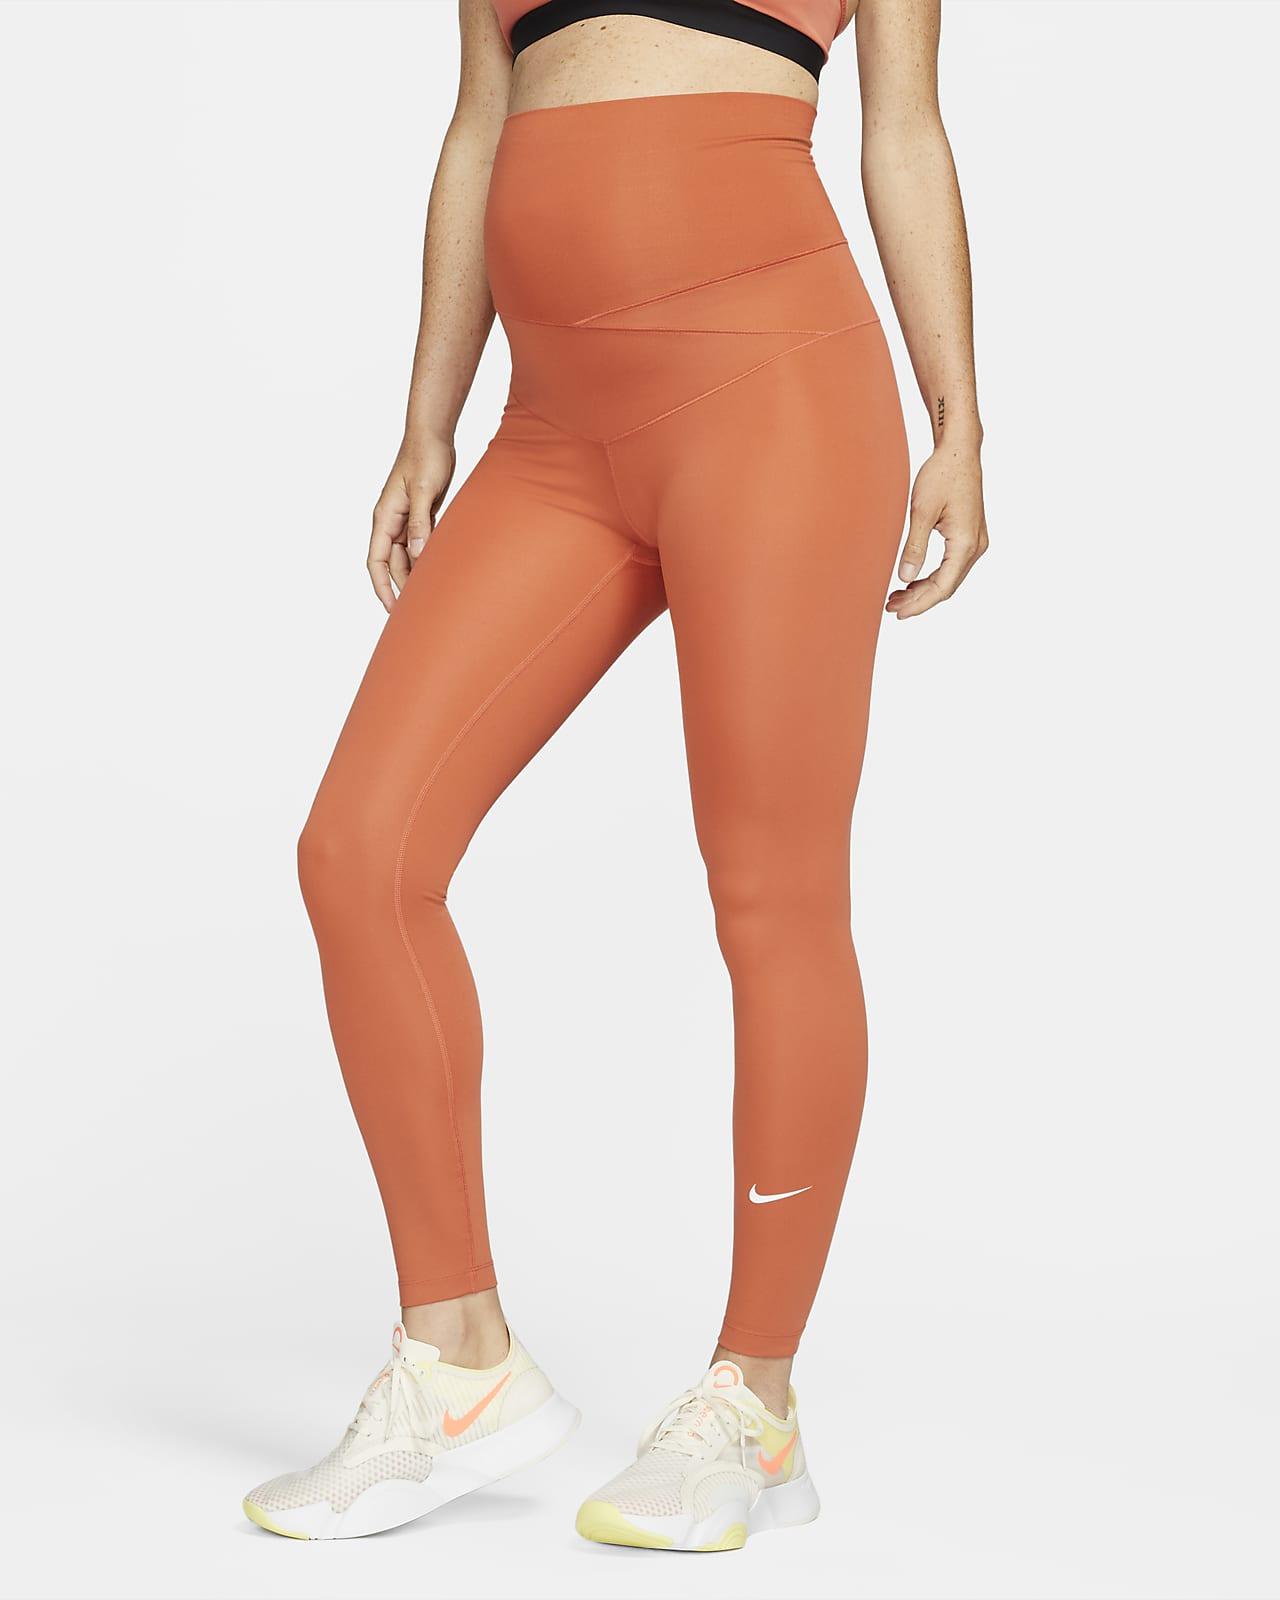 Leggings para mujer Nike One (M) (maternidad)